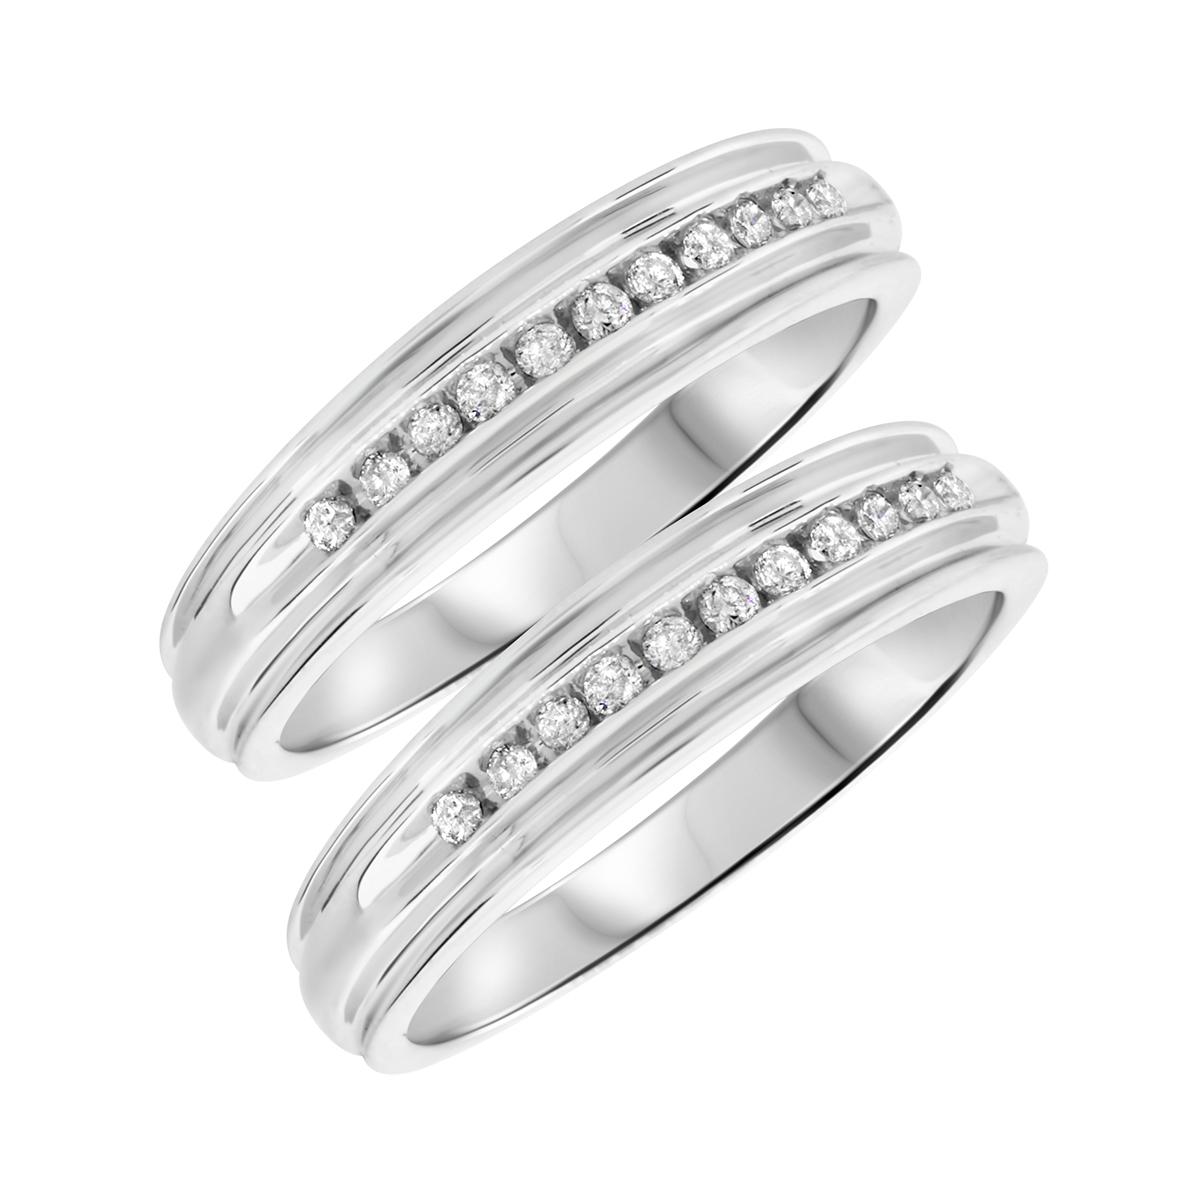 1/3 Carat T.W. Round Cut Mens  Same Sex Wedding Band Set 14K White Gold- Size 8